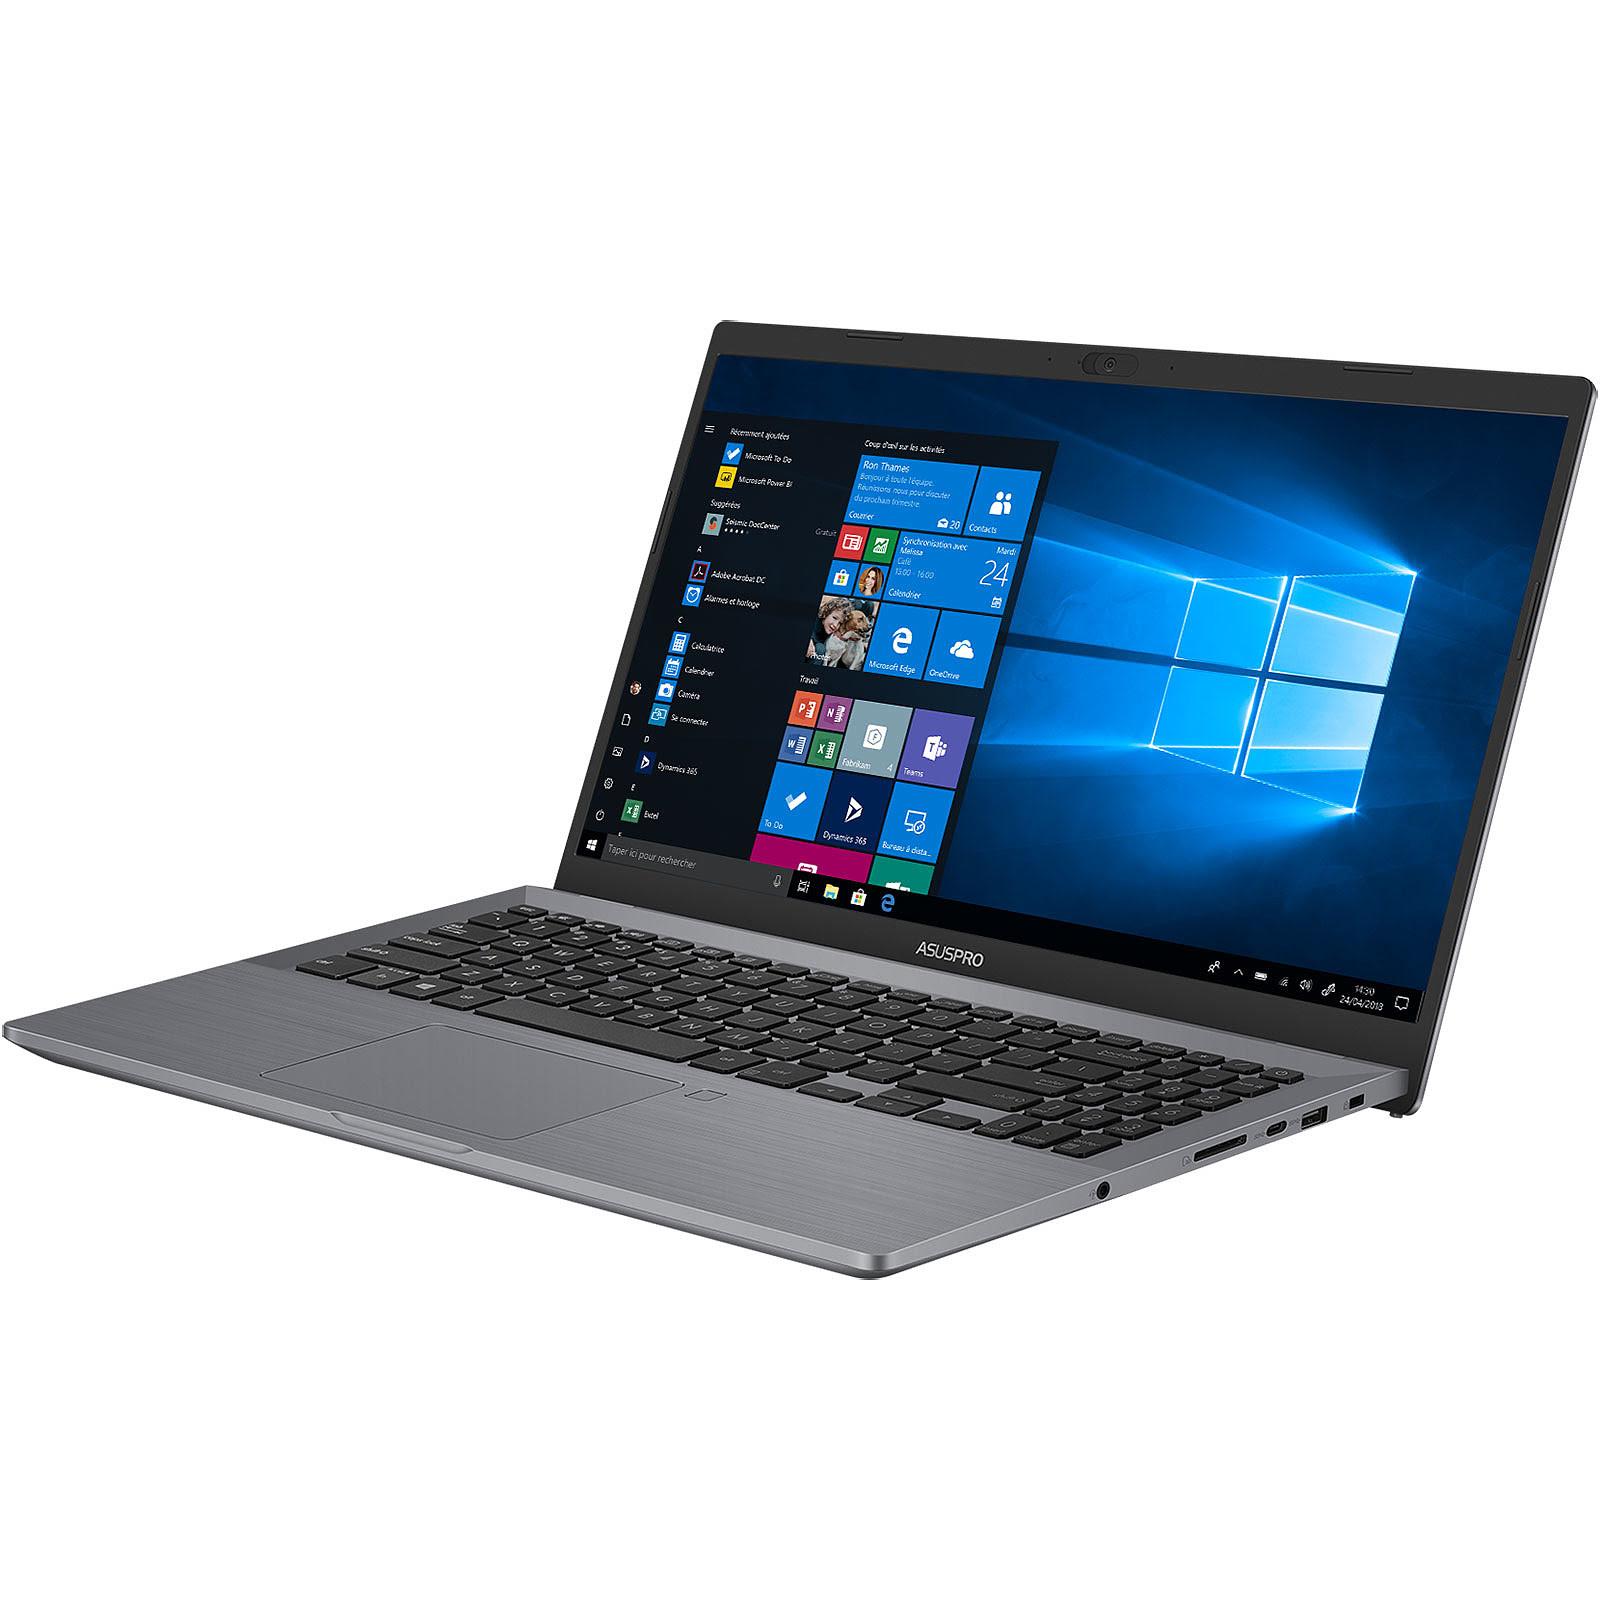 Asus 90NX0261-M16320 - PC portable Asus - Cybertek.fr - 4